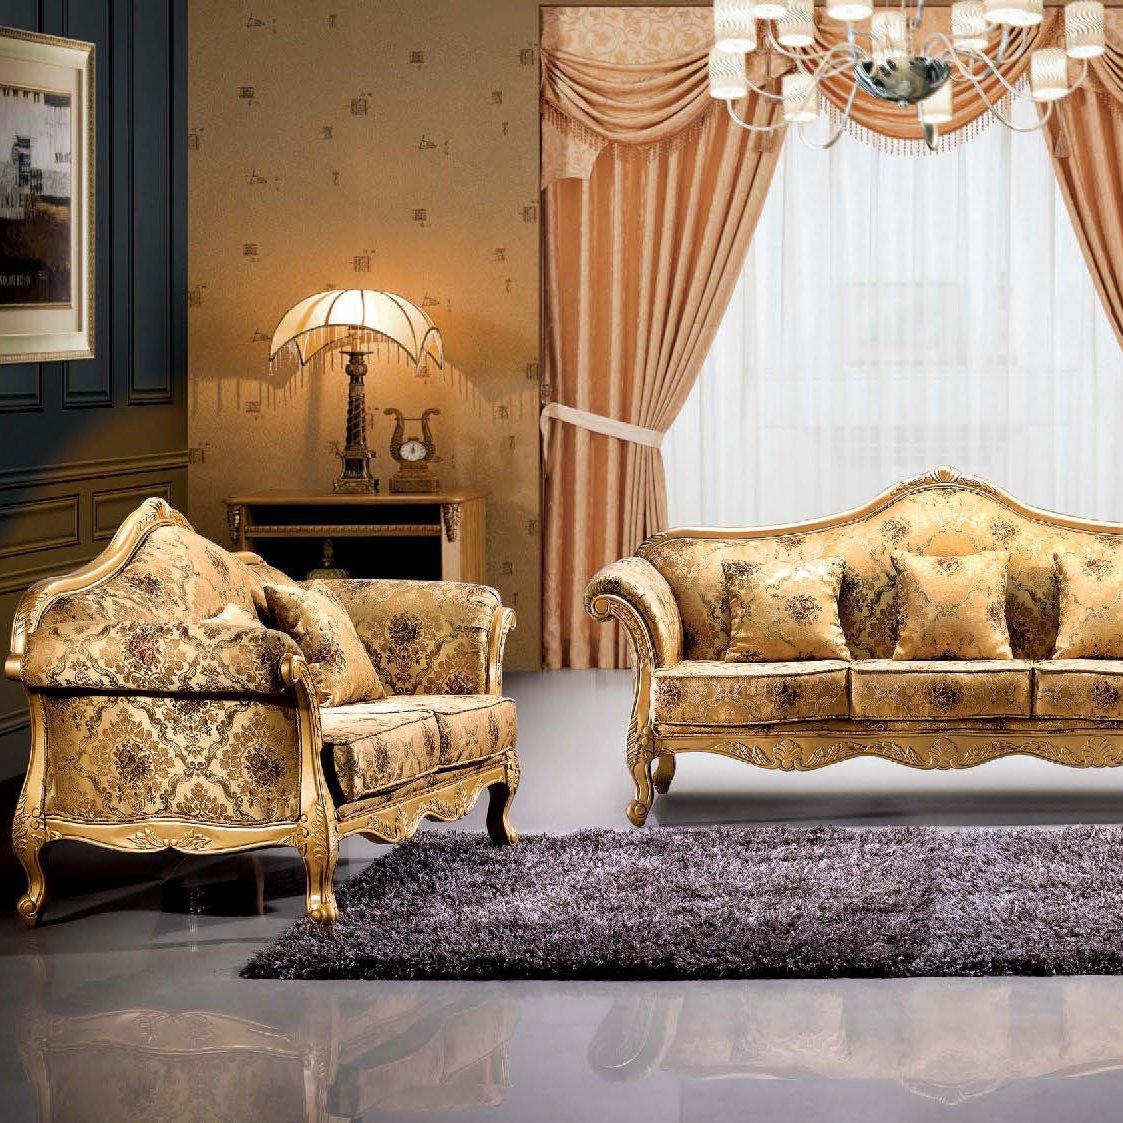 jinxincheng 金鑫铖 欧式沙发 组合 简约欧式真皮沙发 法式沙发 美式图片